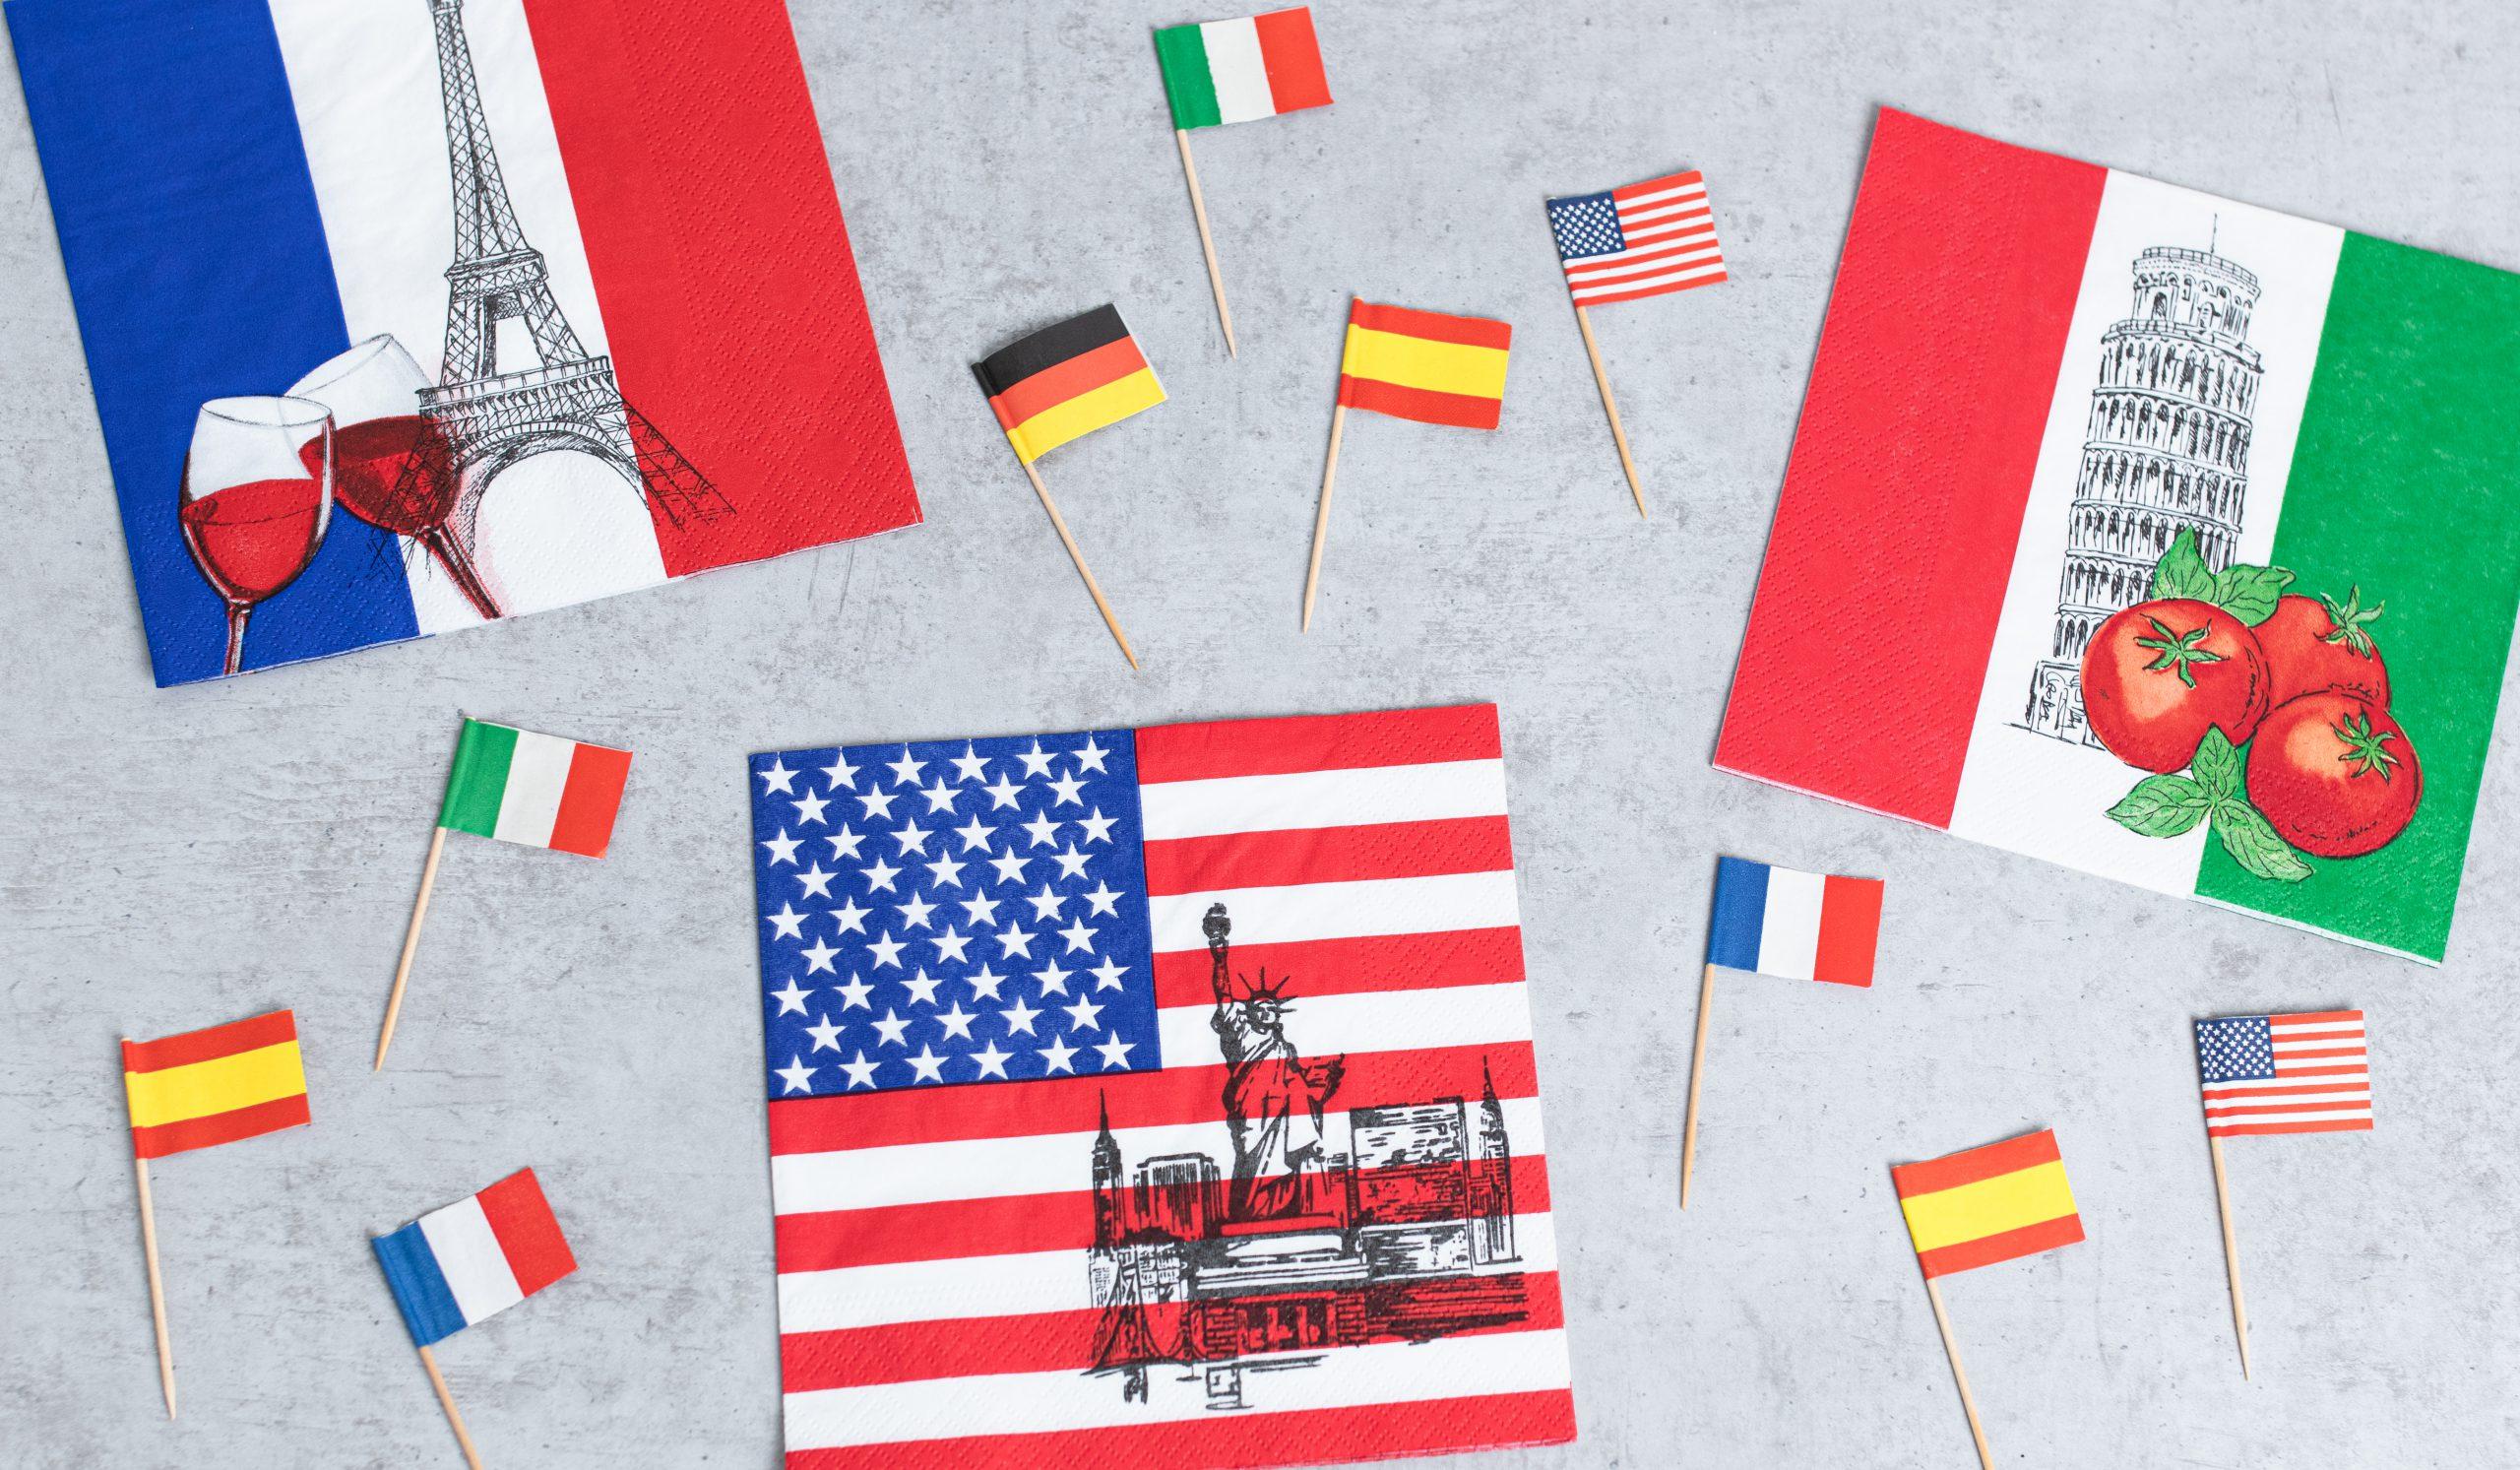 landen-vlaggetjes-speciale-evenementen-conpax